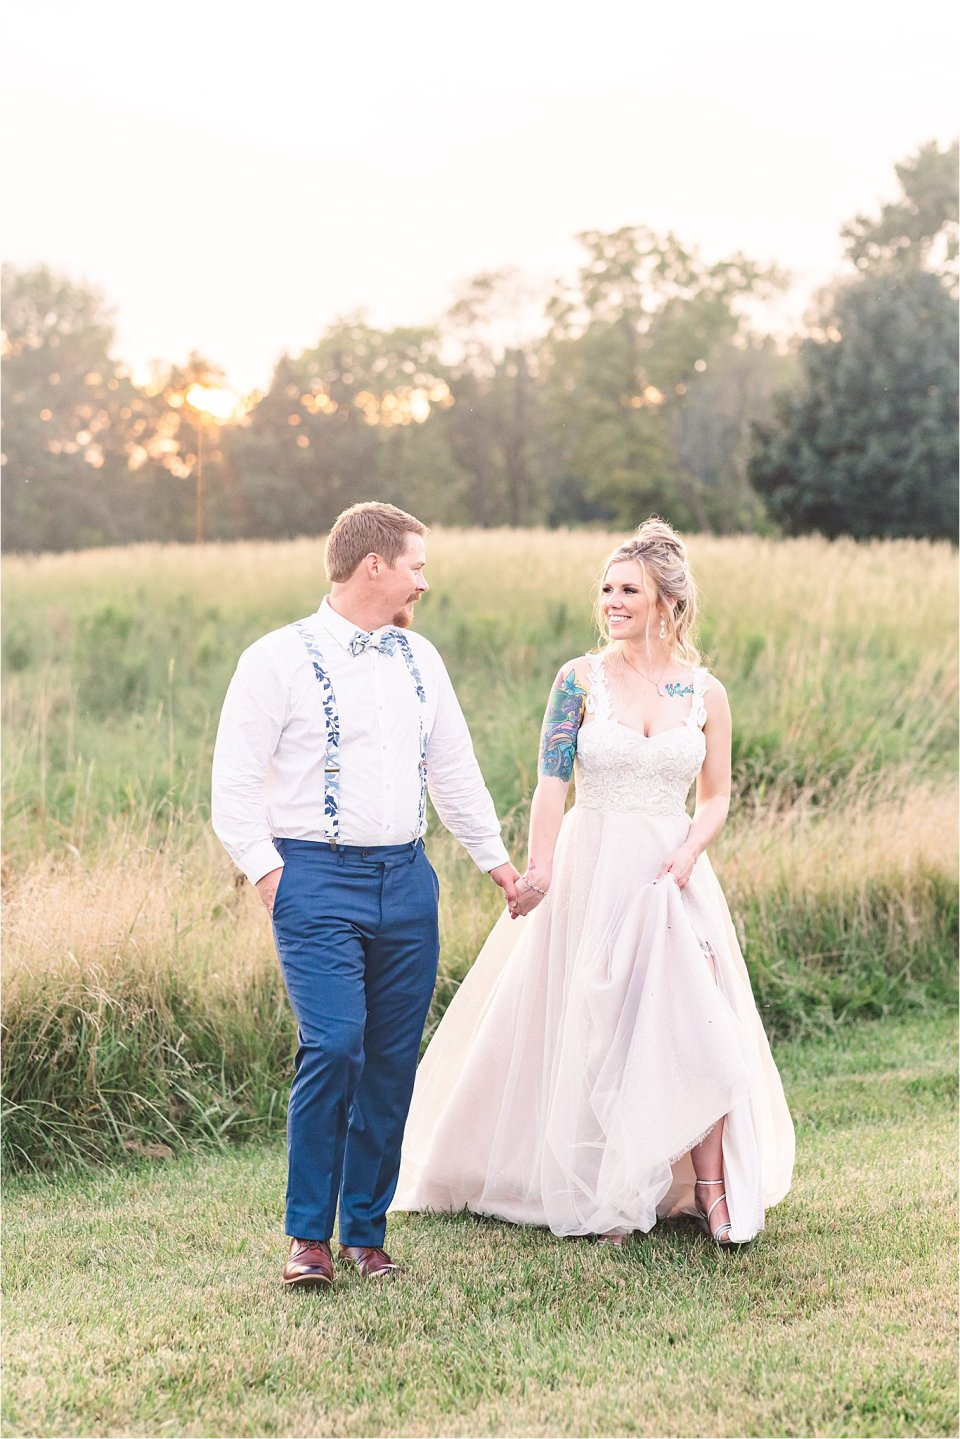 Central Illinois Wedding at Sugar Creek Barn